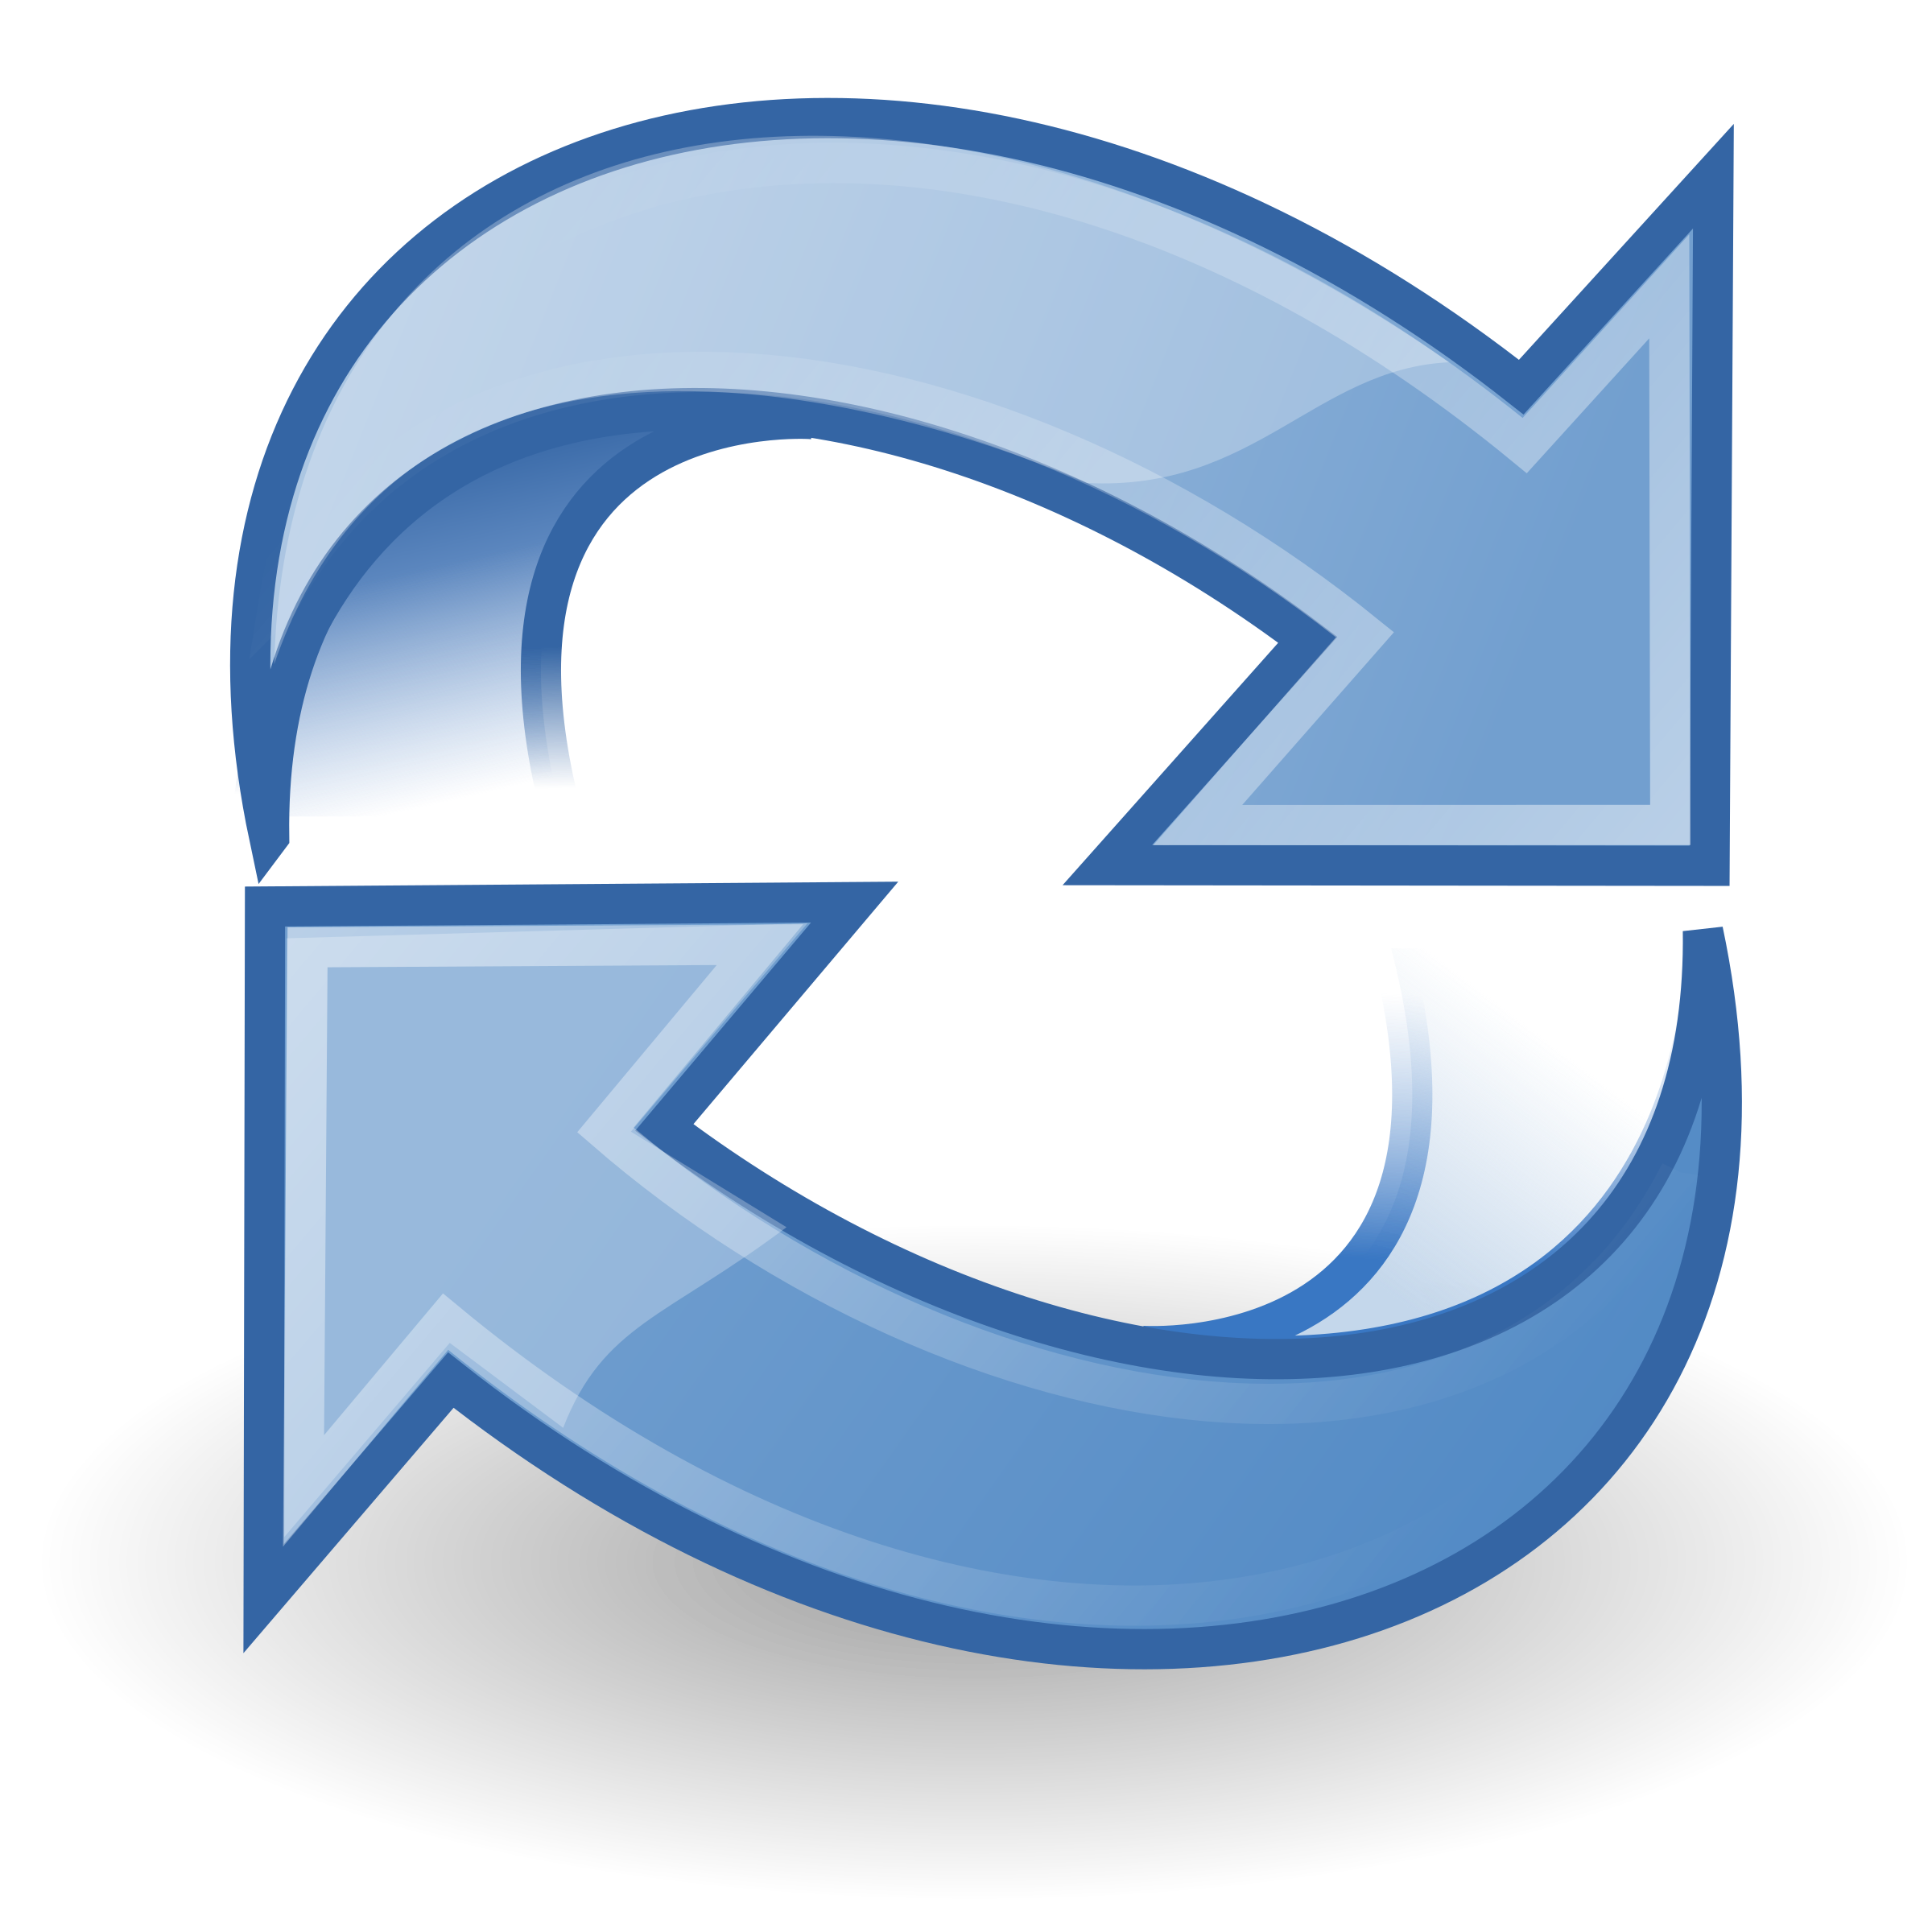 2400x2400 Refresh Icon Vector Clipart Image